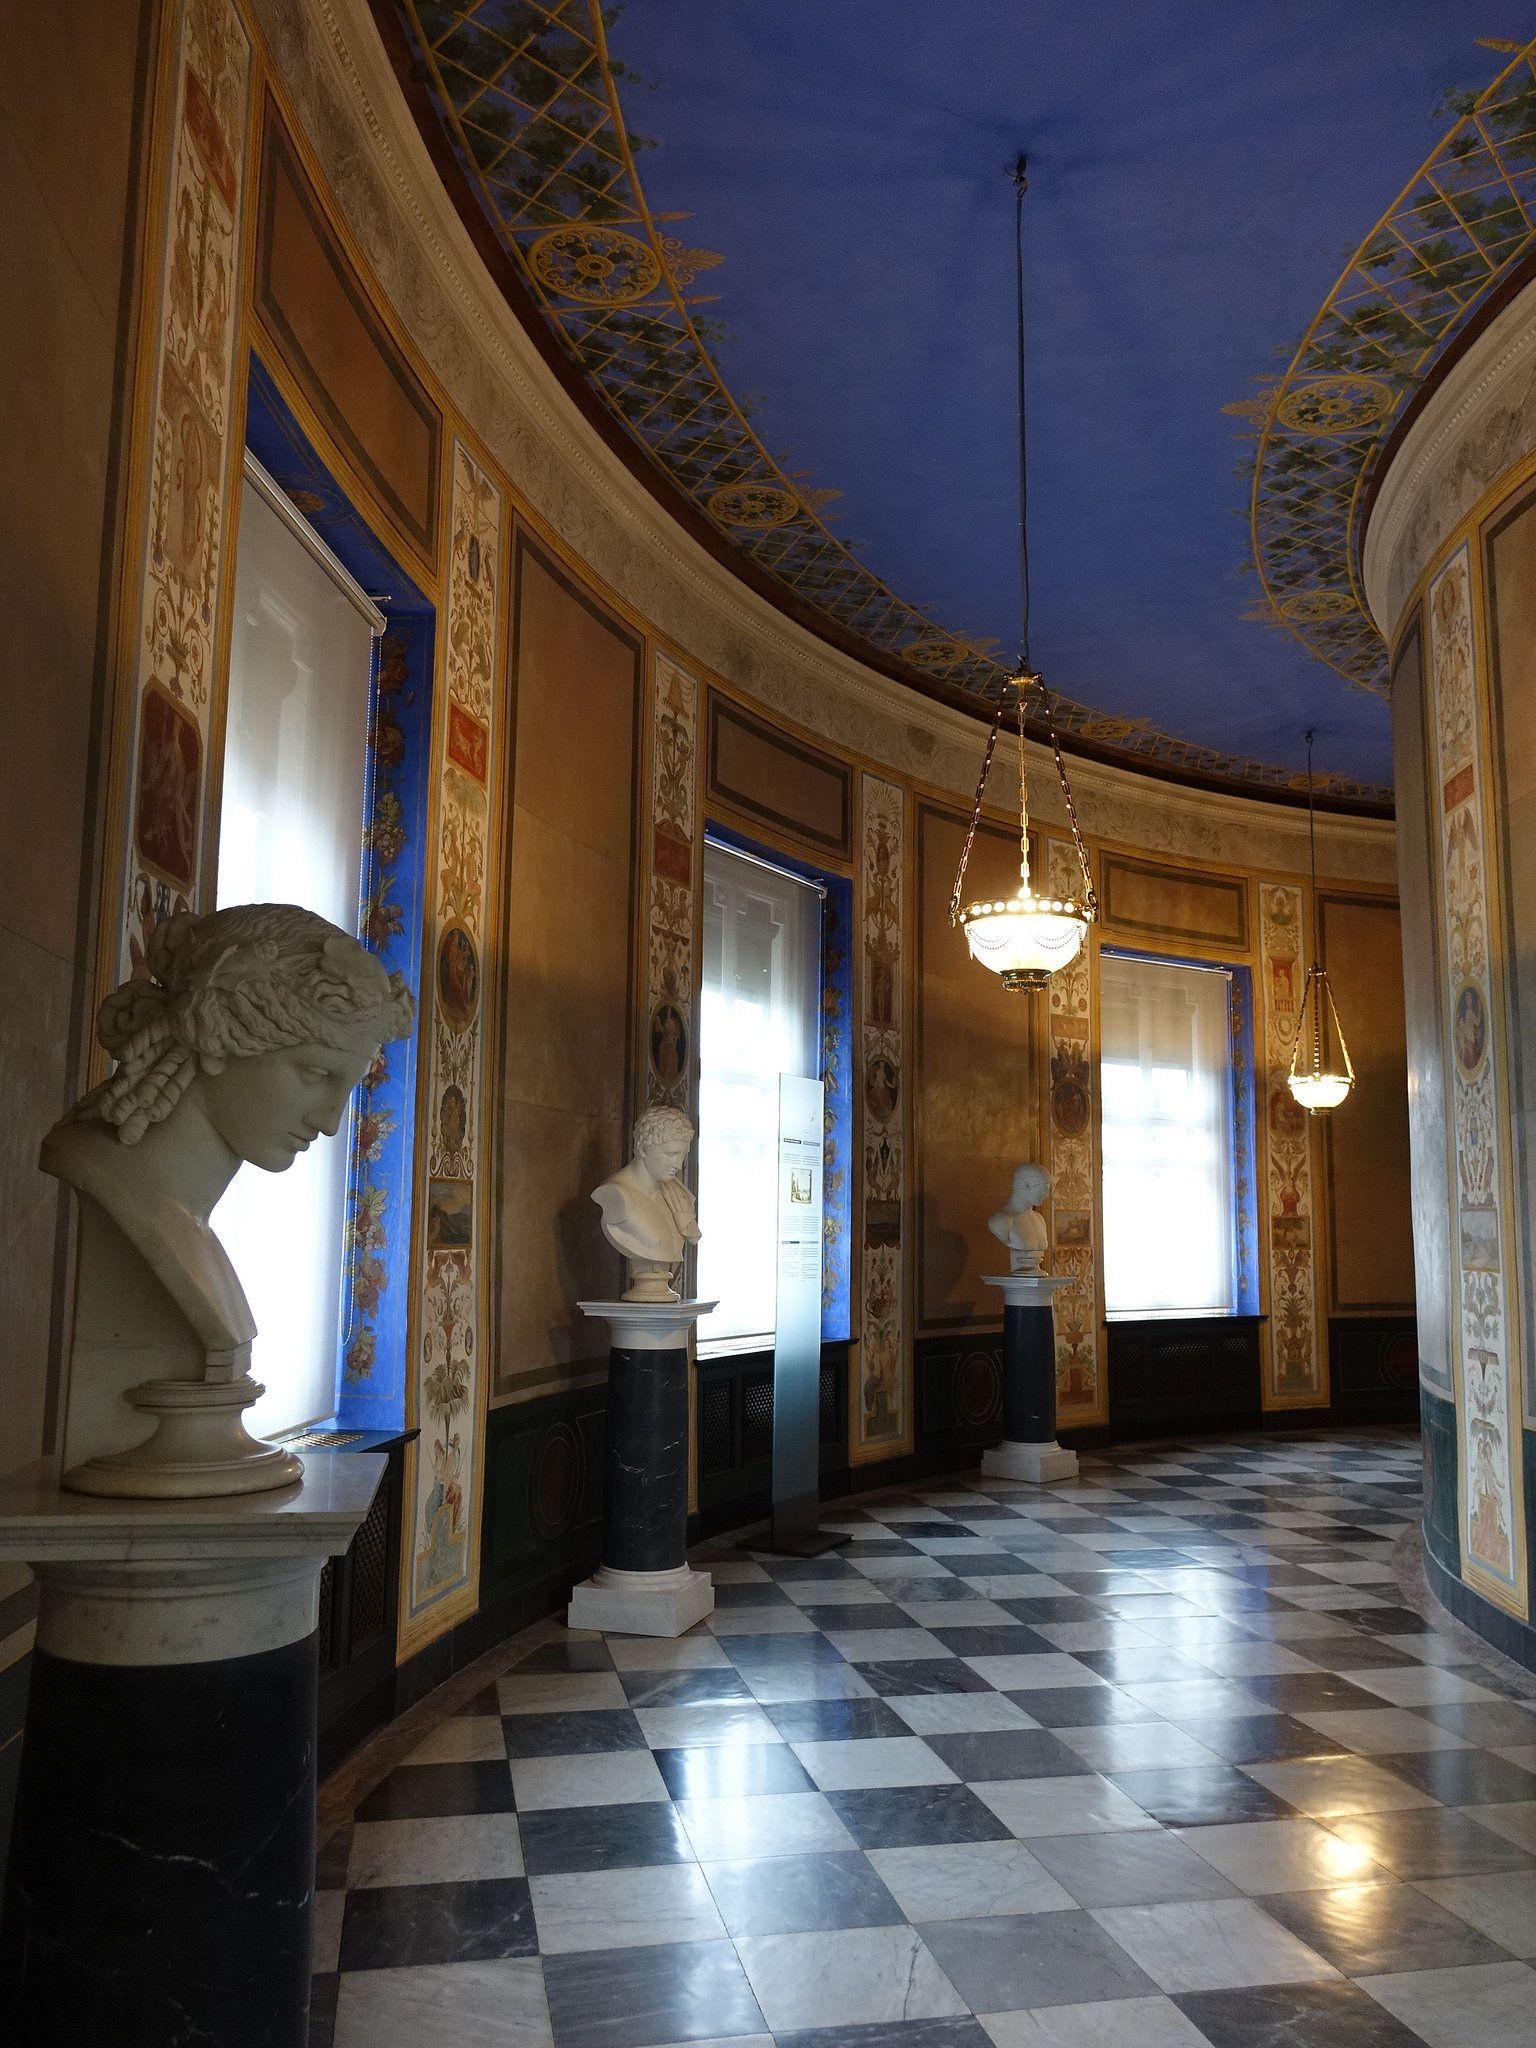 Marmorpalais Marble Palace Neuer Garten Potsdam Brandenburg Germany Royal Residence Palace Terrace